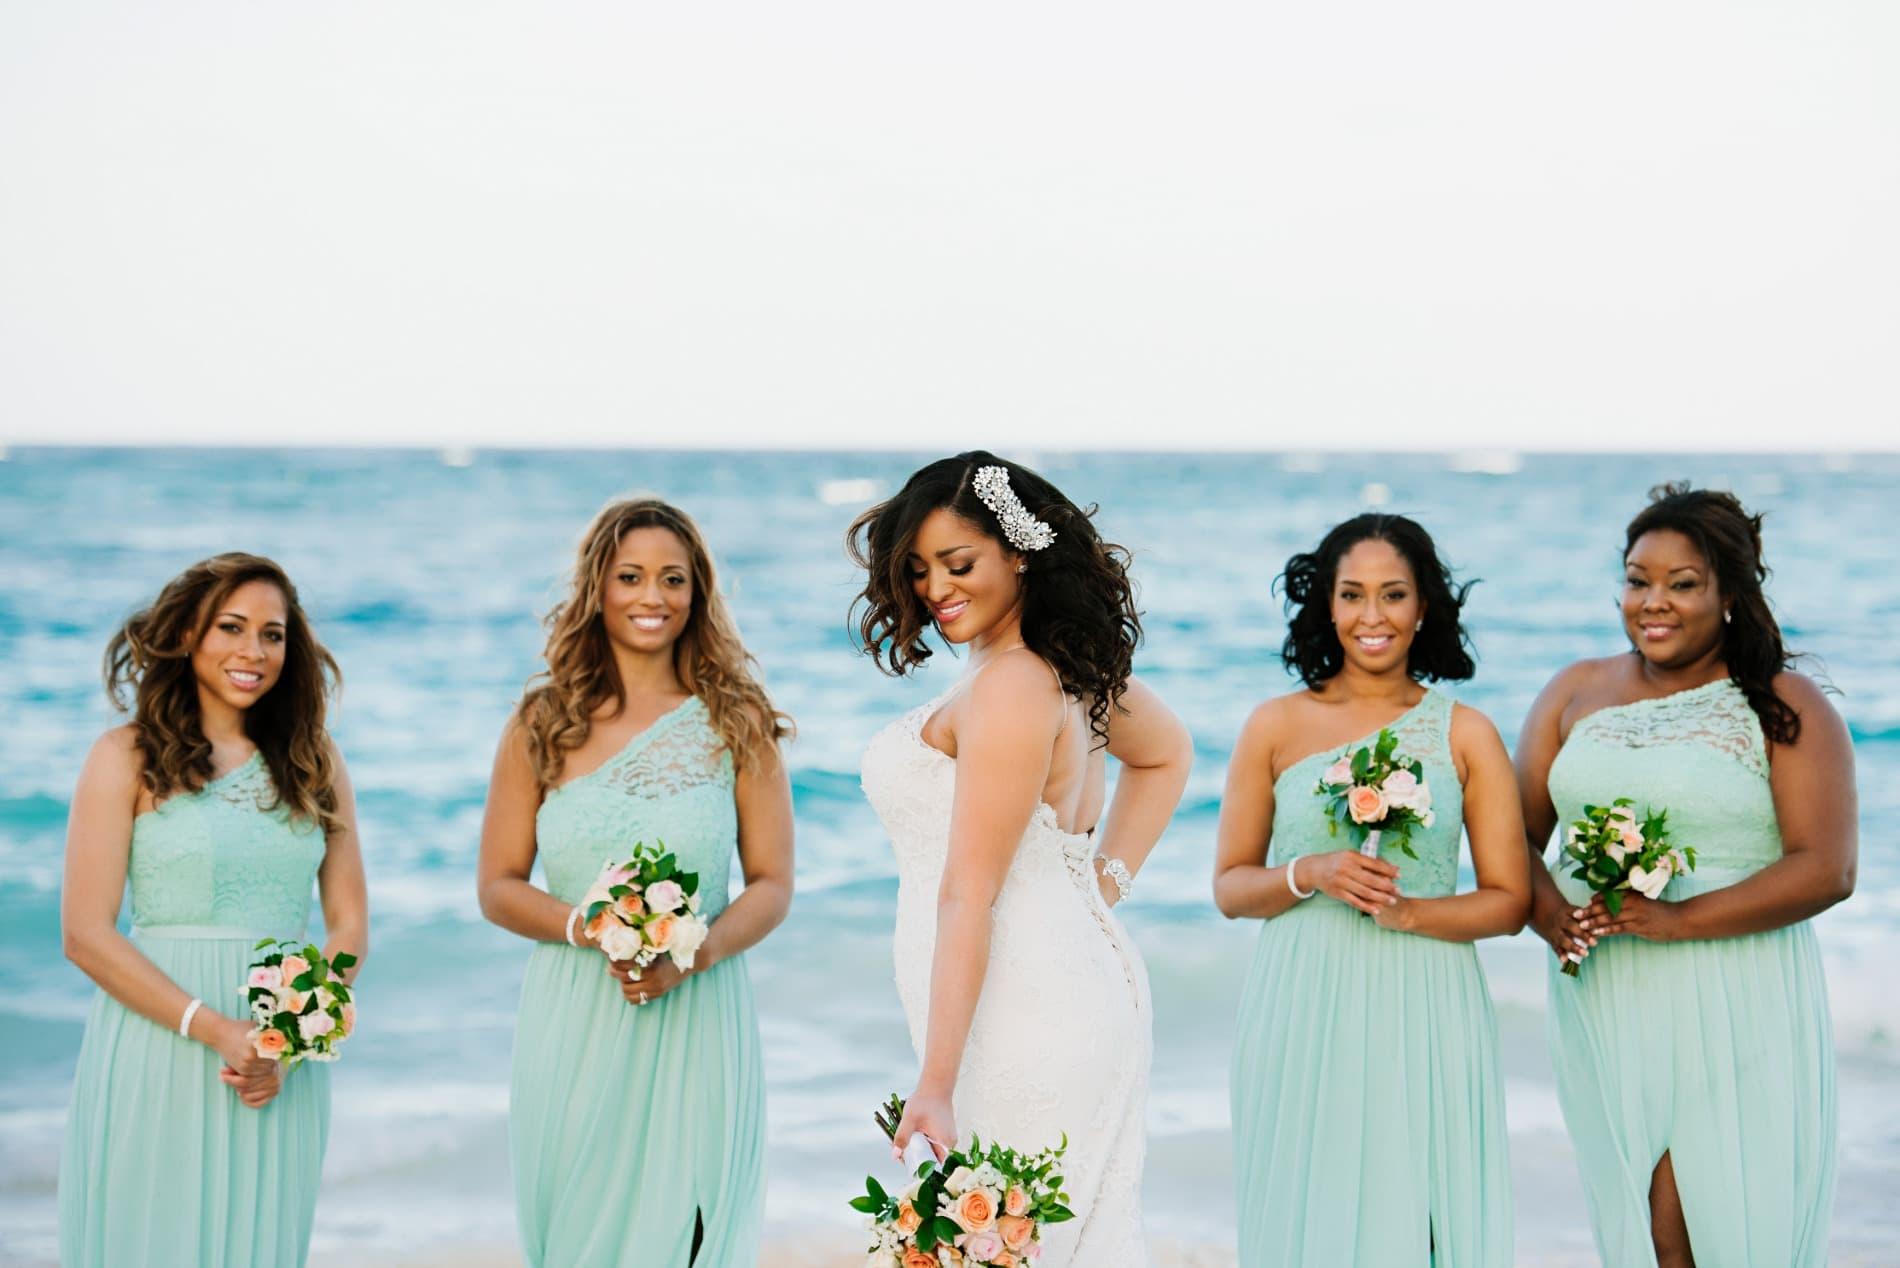 Beach Bridesmaid Dress Photos & Tips